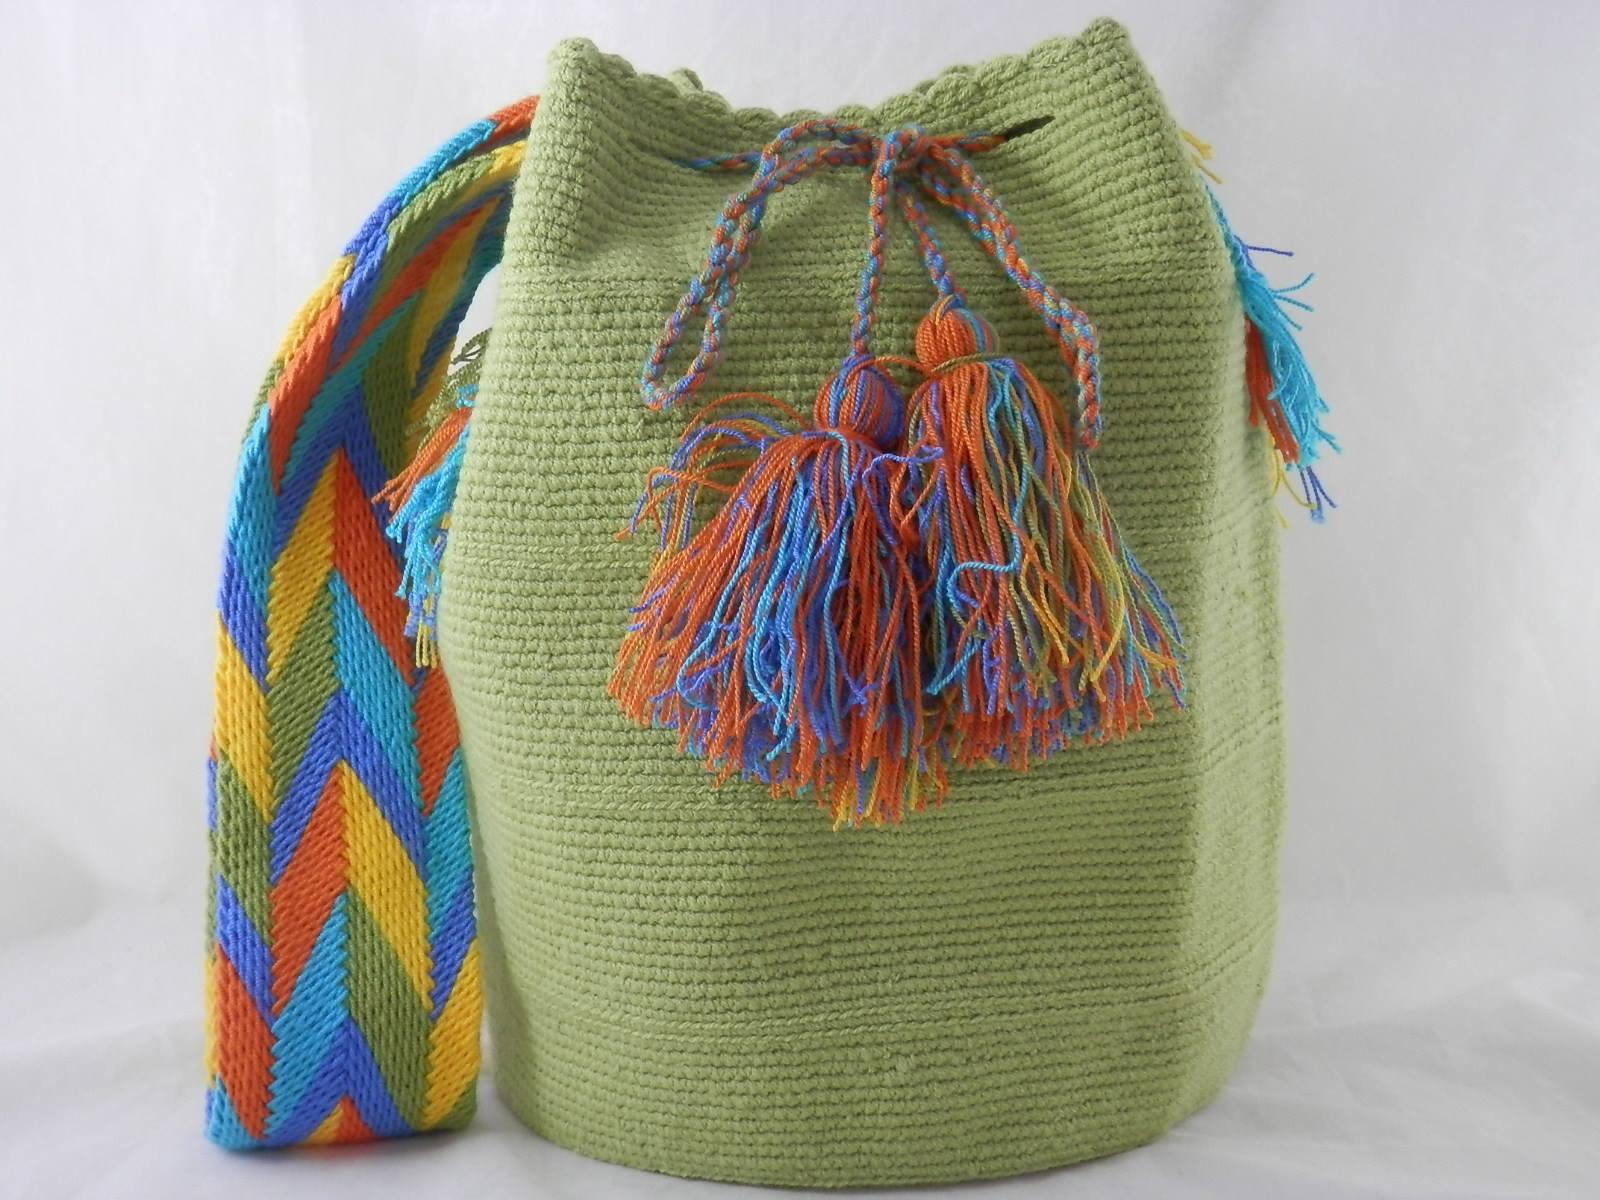 IWayuu Bag by PPS-MG_9121